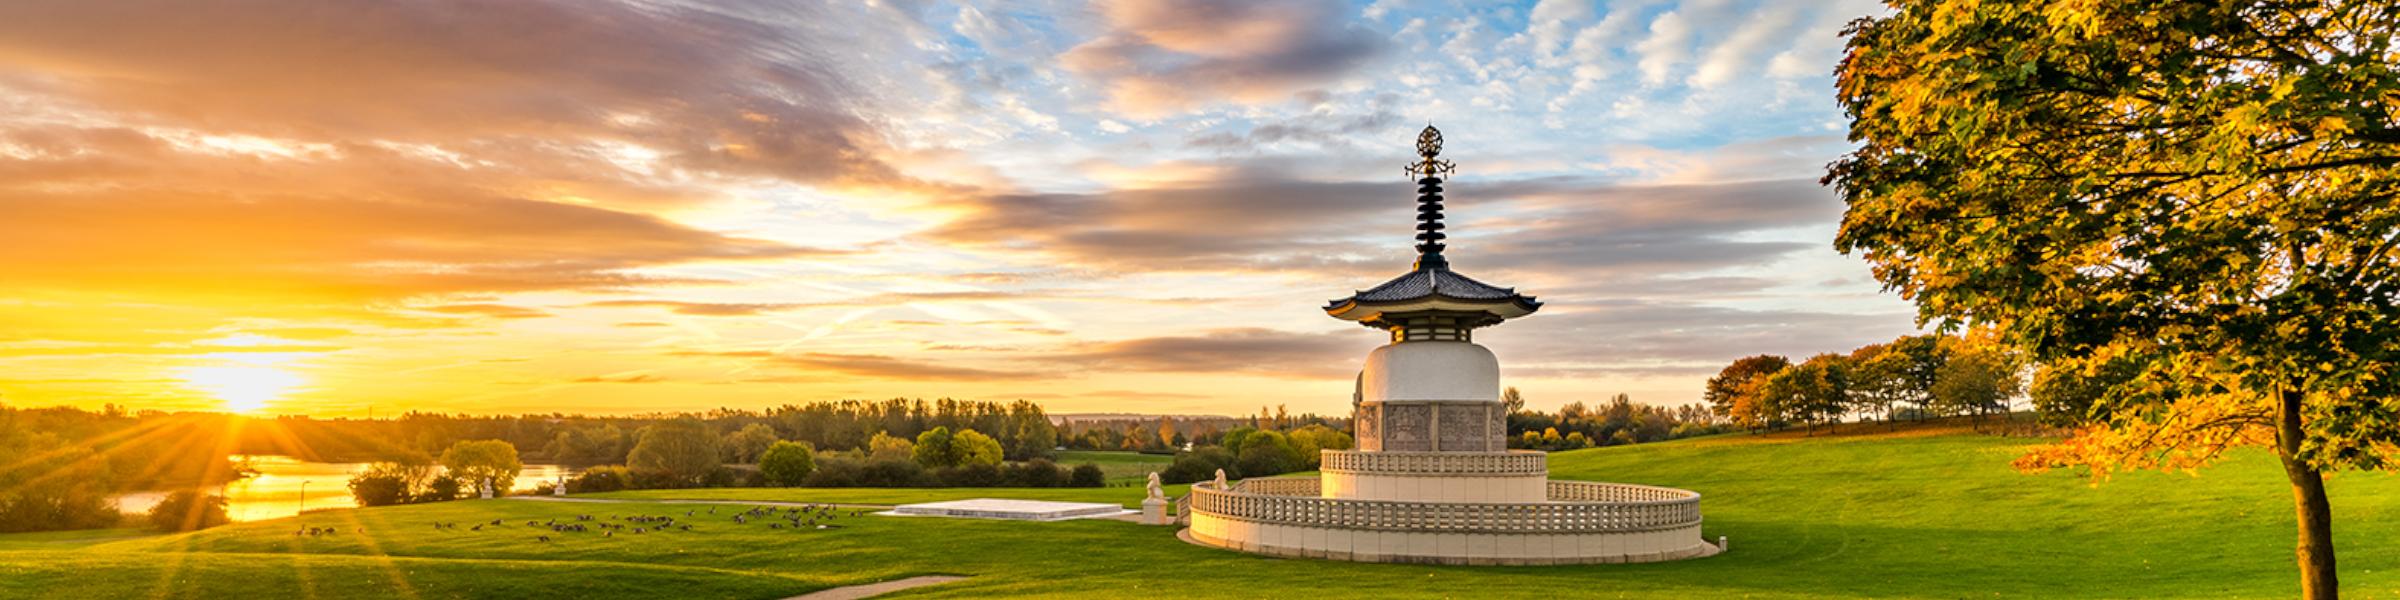 Peace Pagoda in Milton Keynes